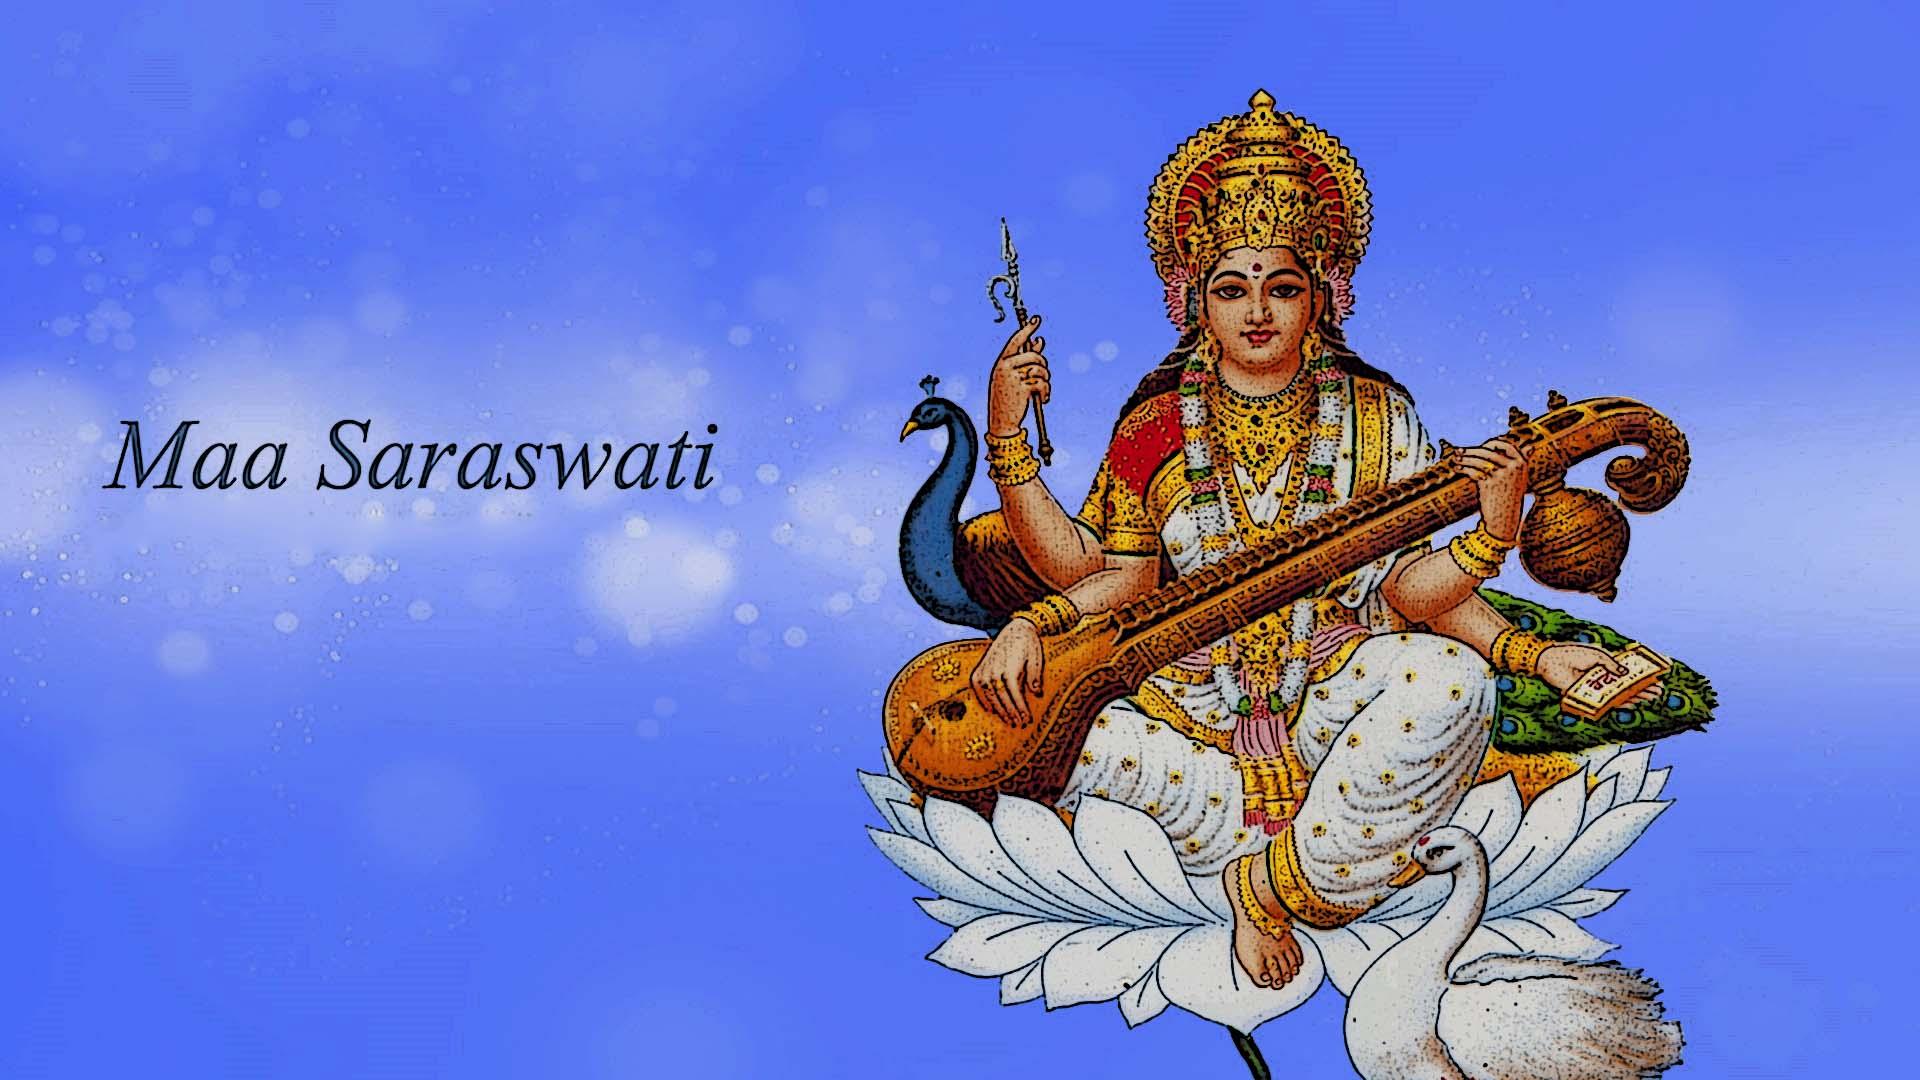 Maa Saraswati 3d Wallpaper 2017